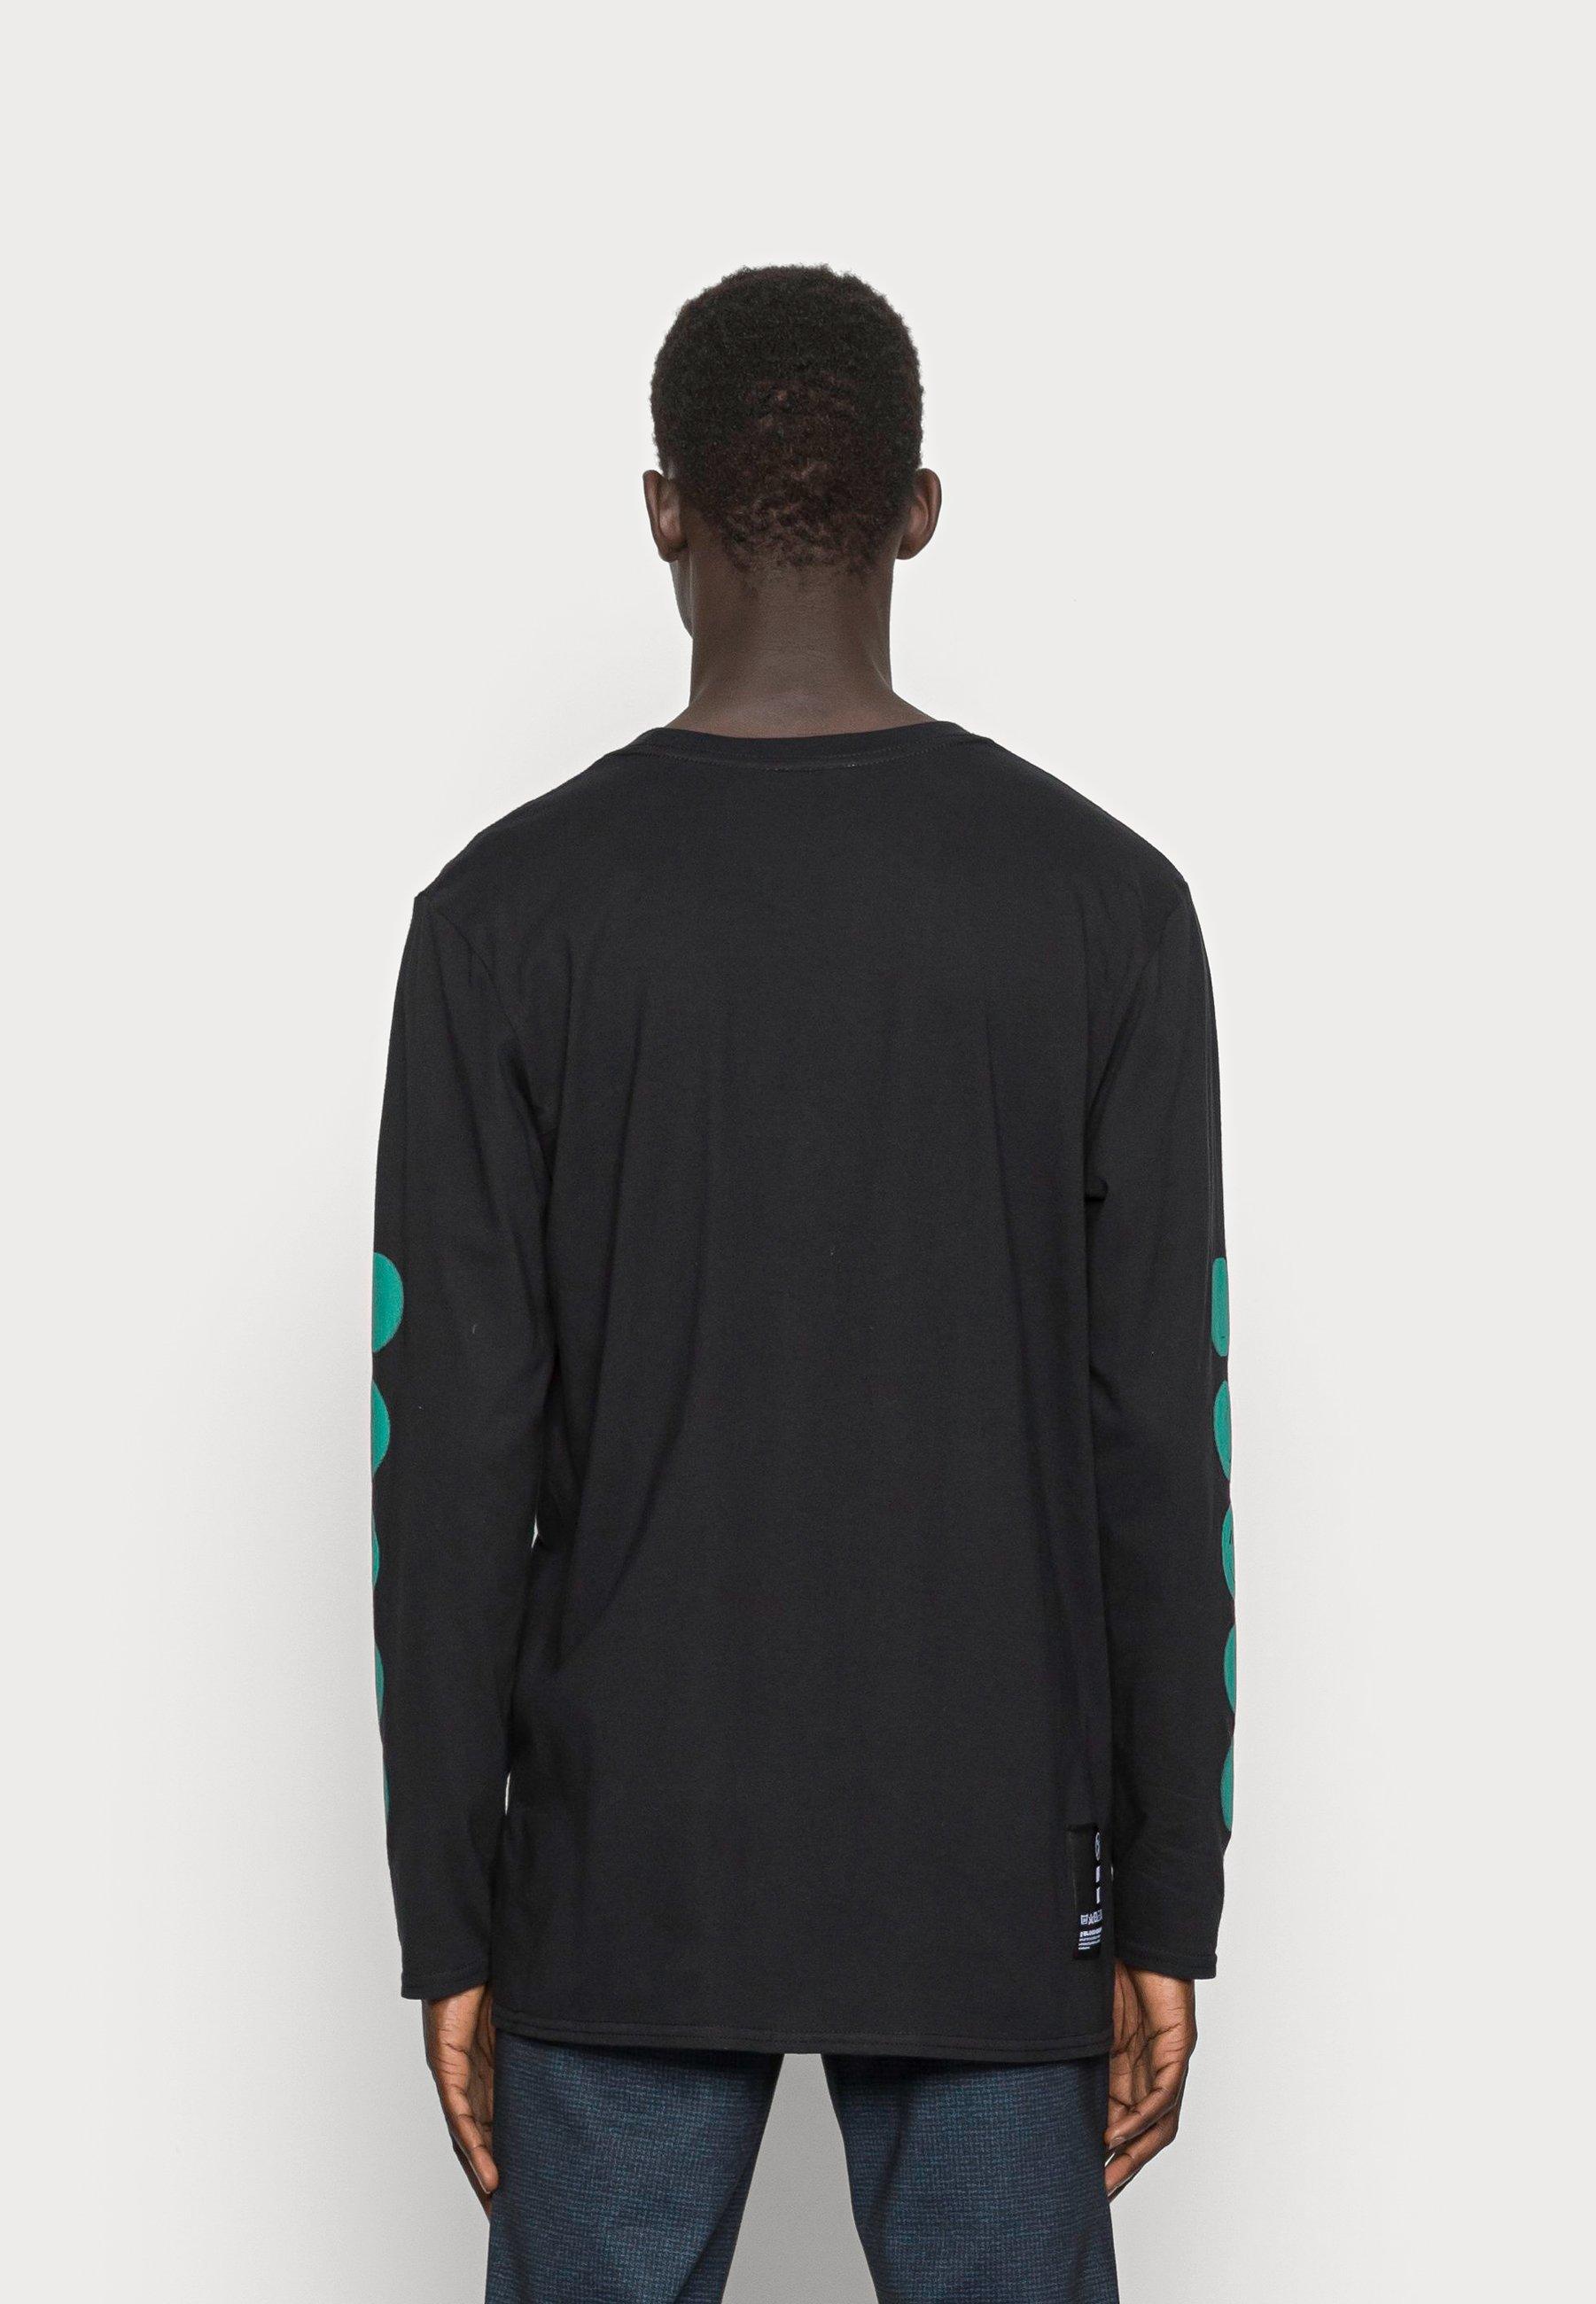 Uomo BLUR FACE SLEEVE - Maglietta a manica lunga